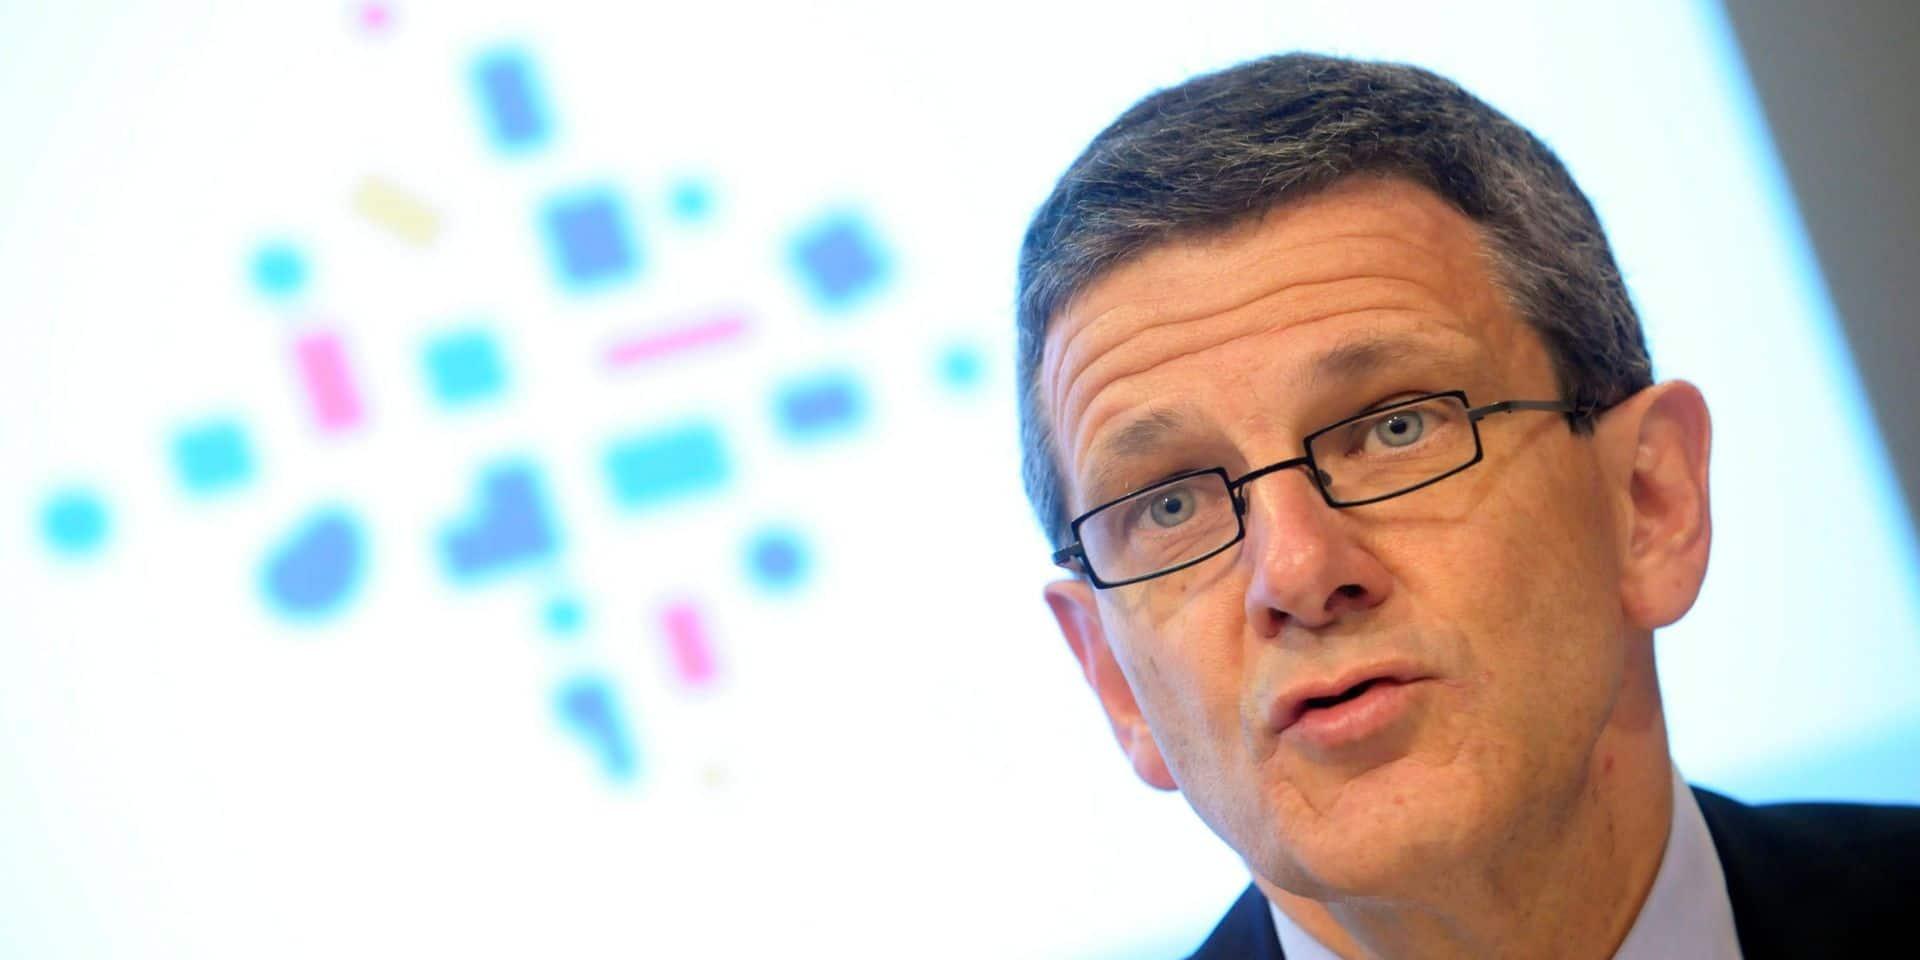 L'ancien numéro deux de BNP Paribas Fortis attaque la banque en justice